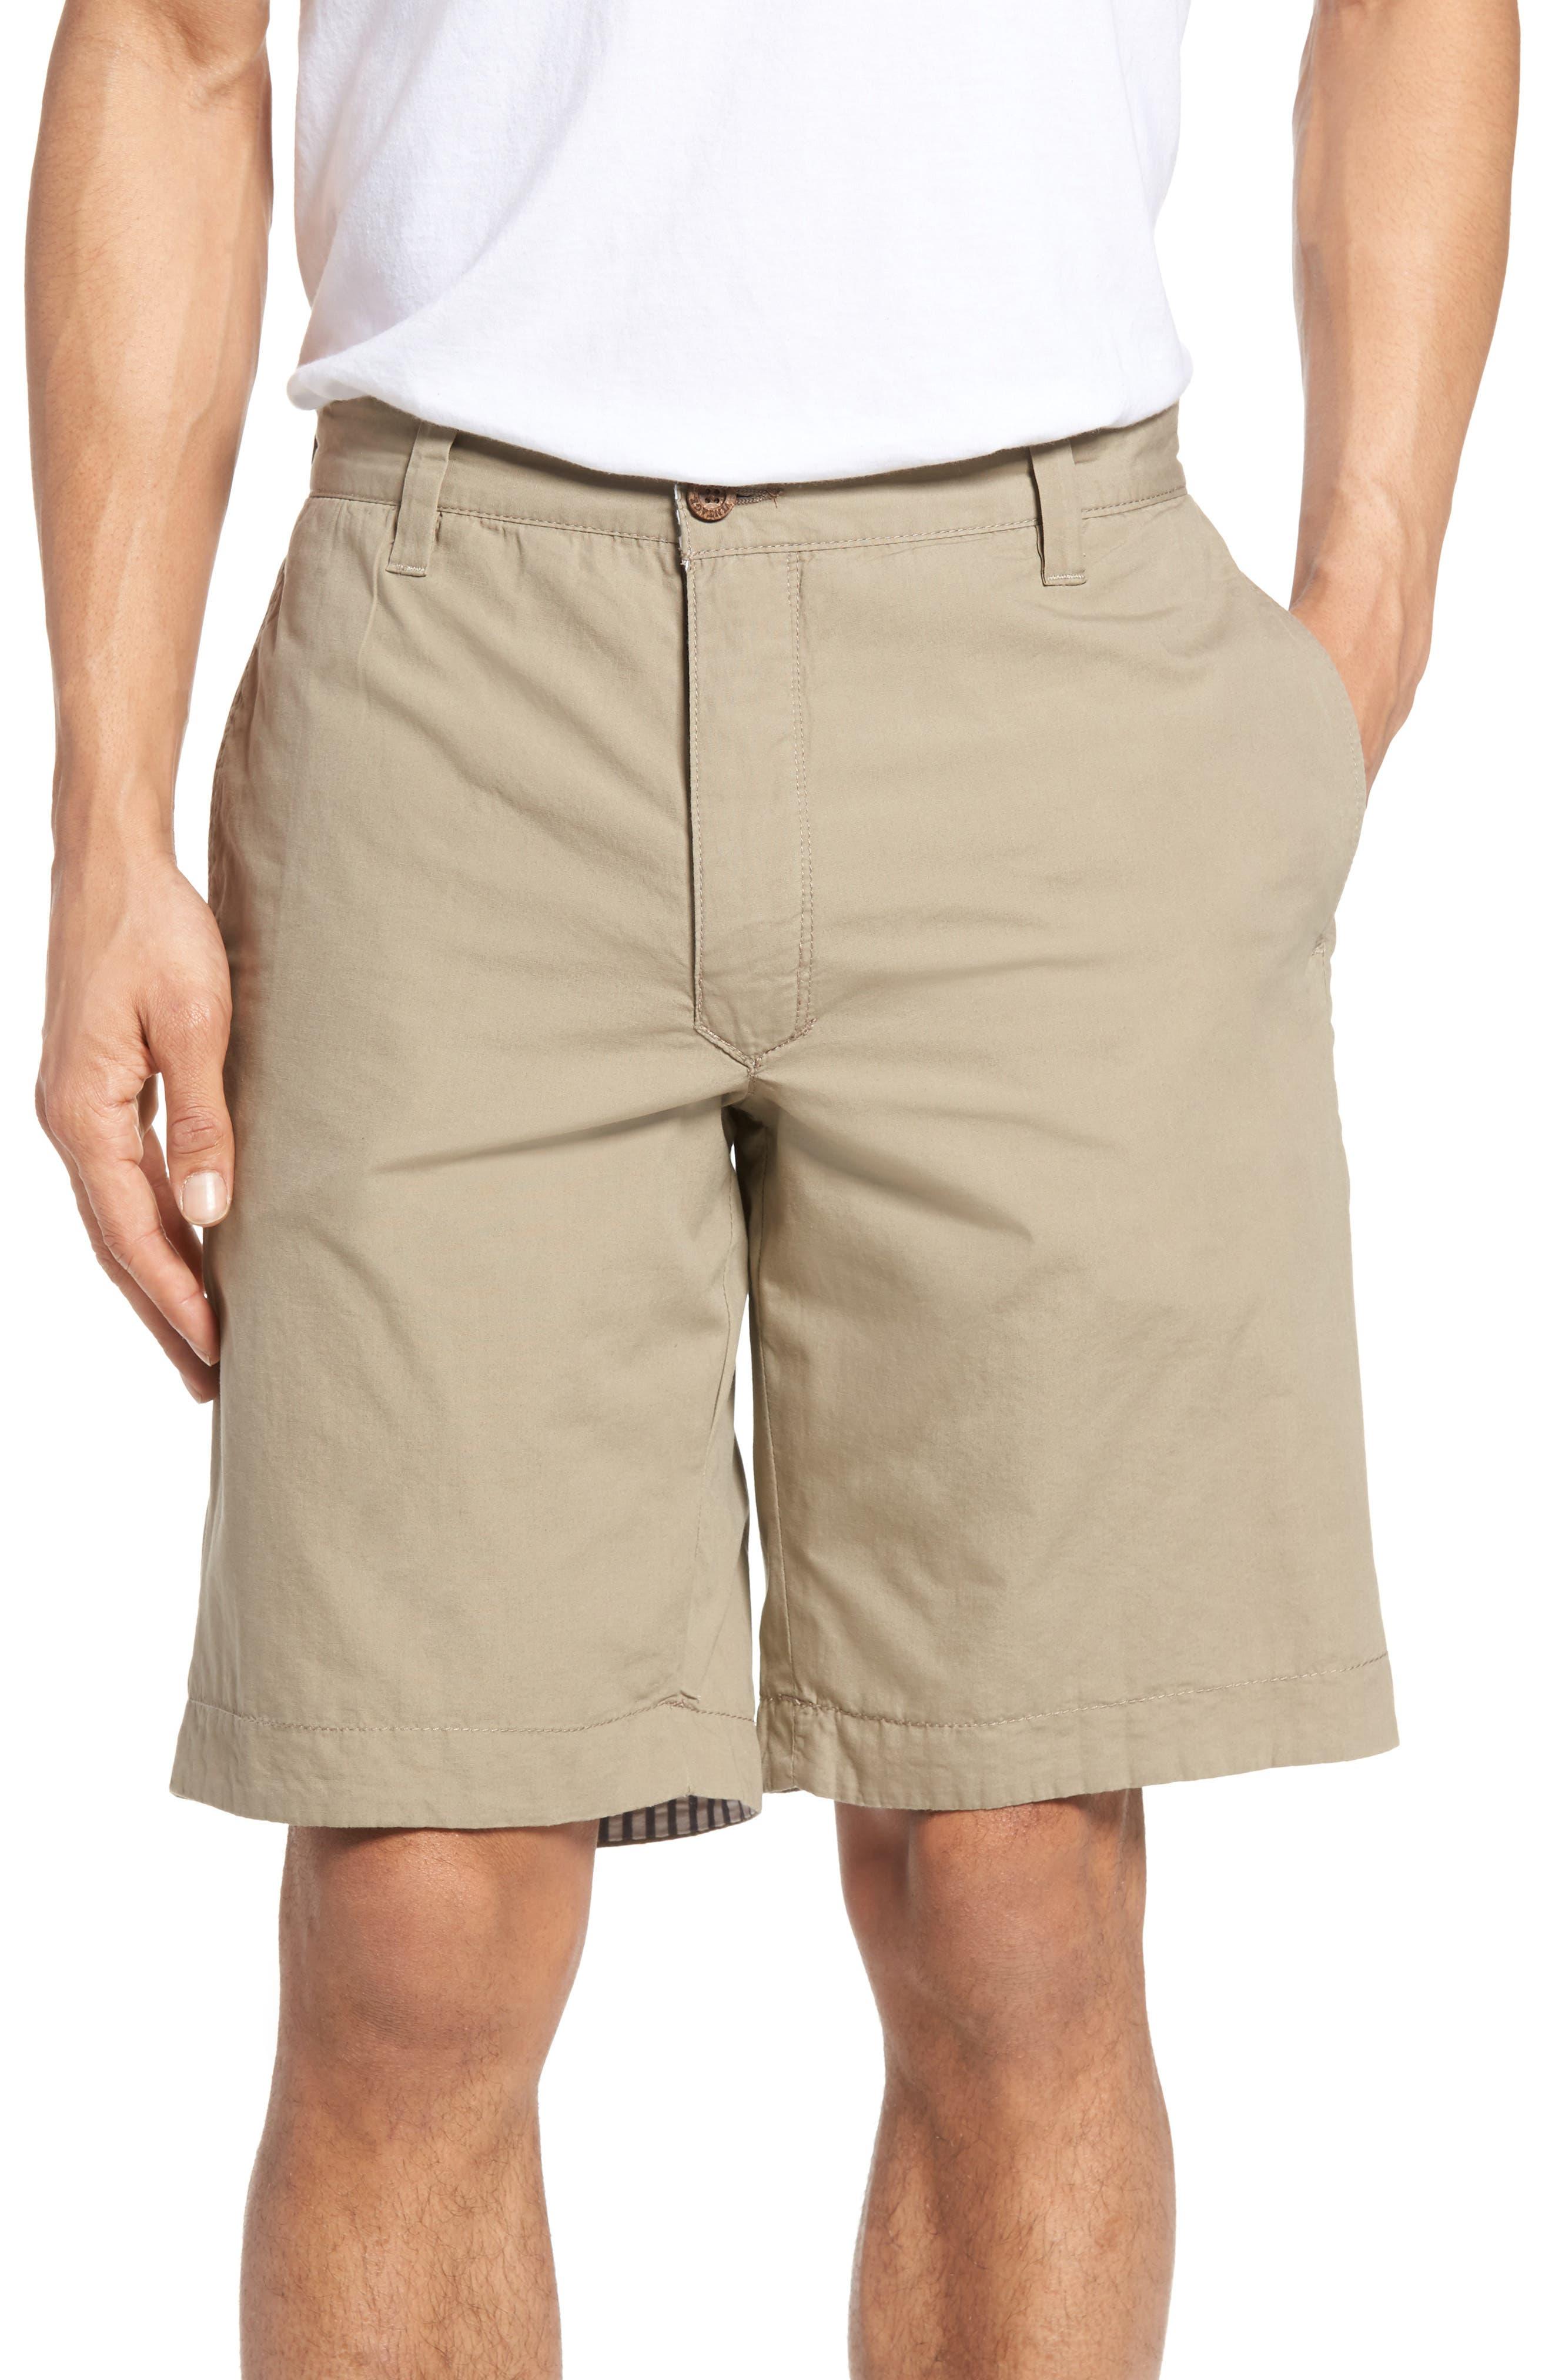 Alternate Image 1 Selected - Tailor Vintage Reversible Walking Shorts